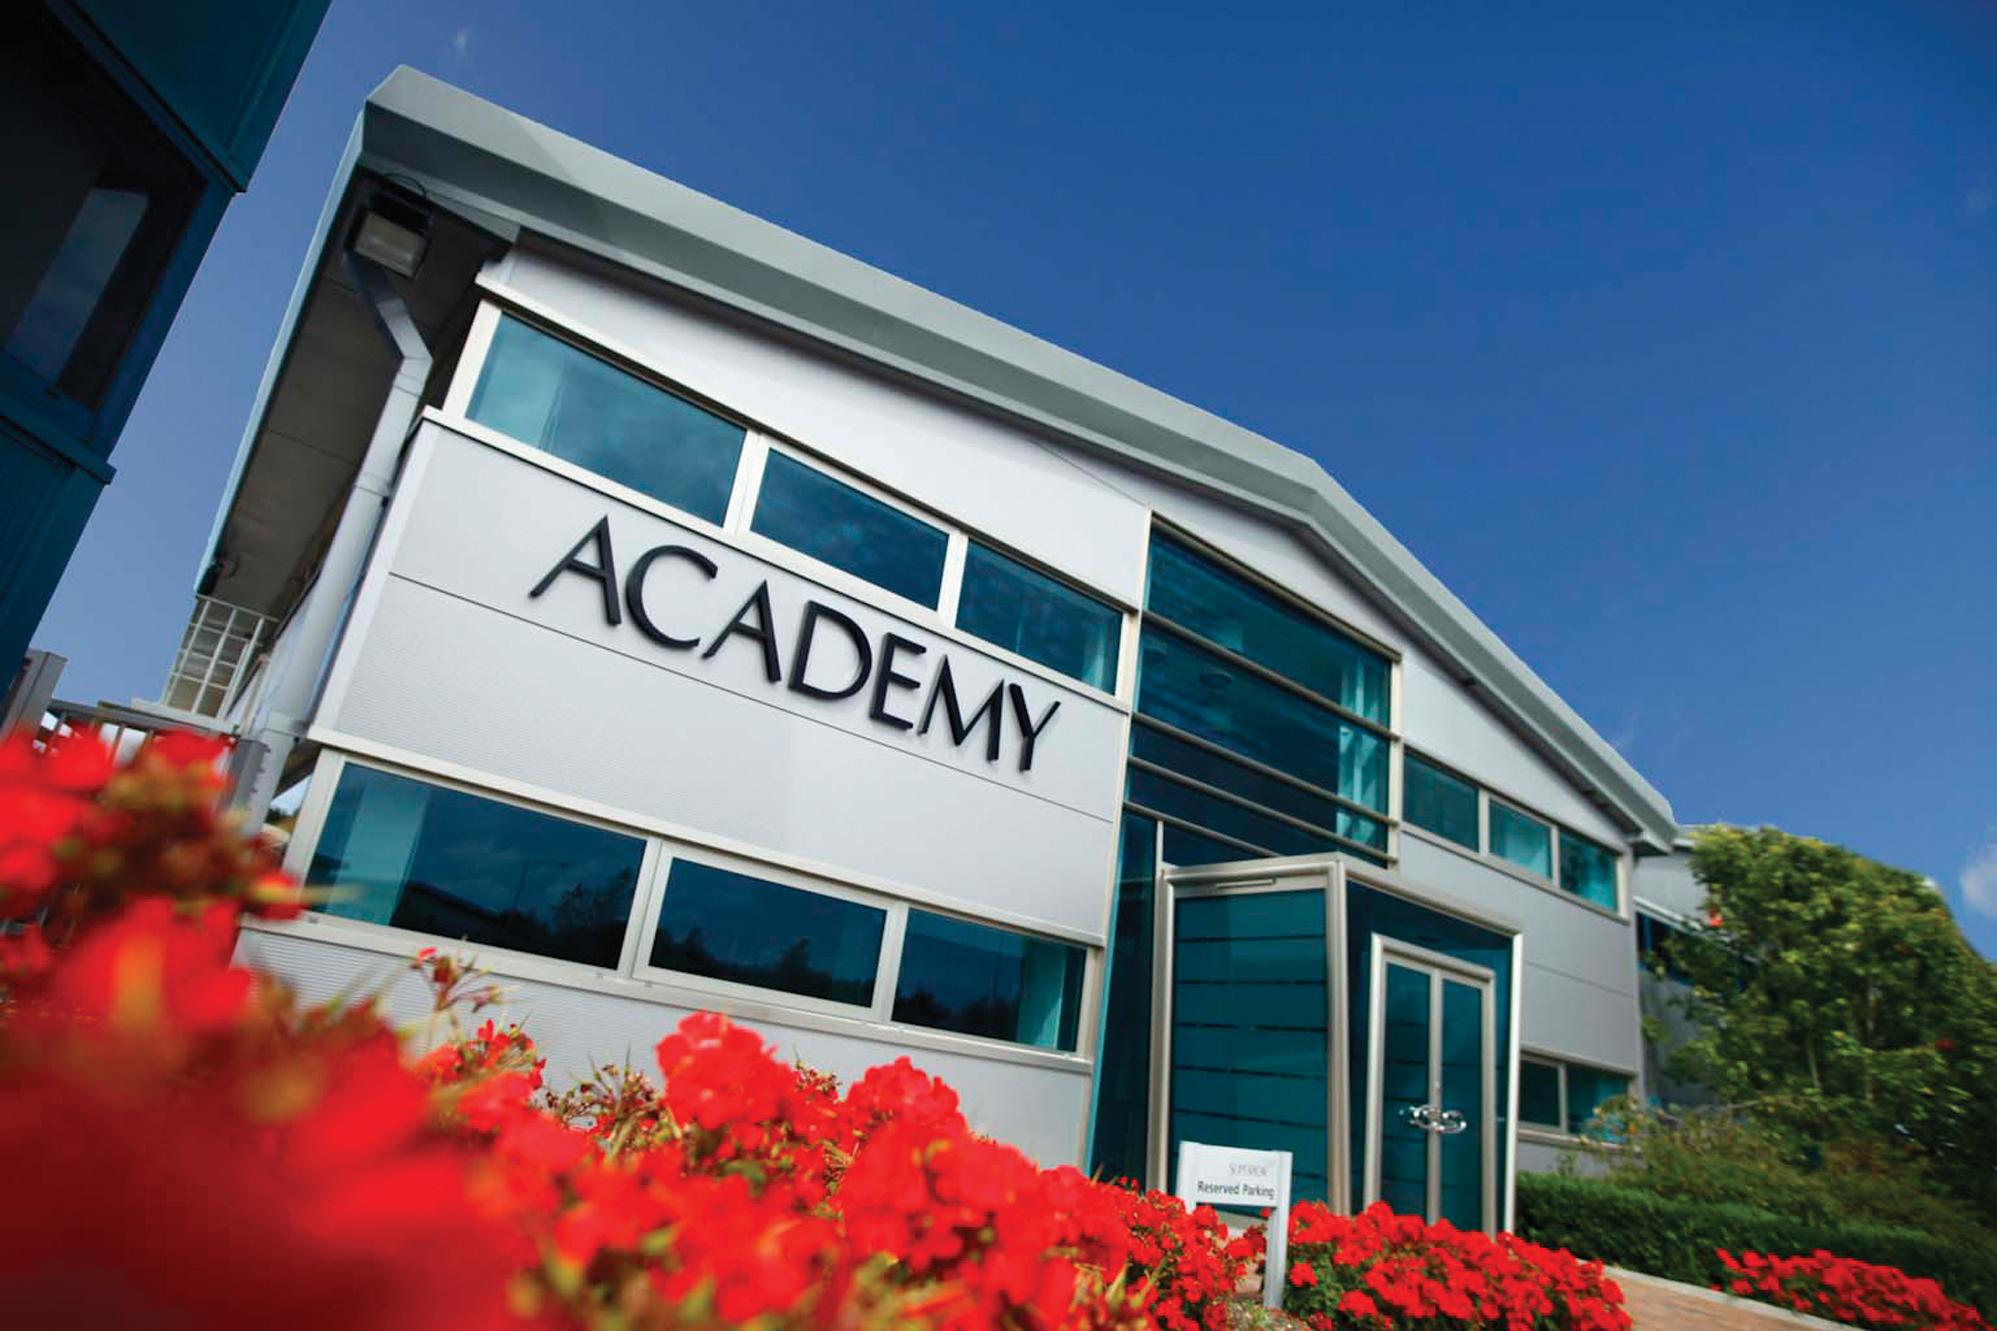 Superior Academy